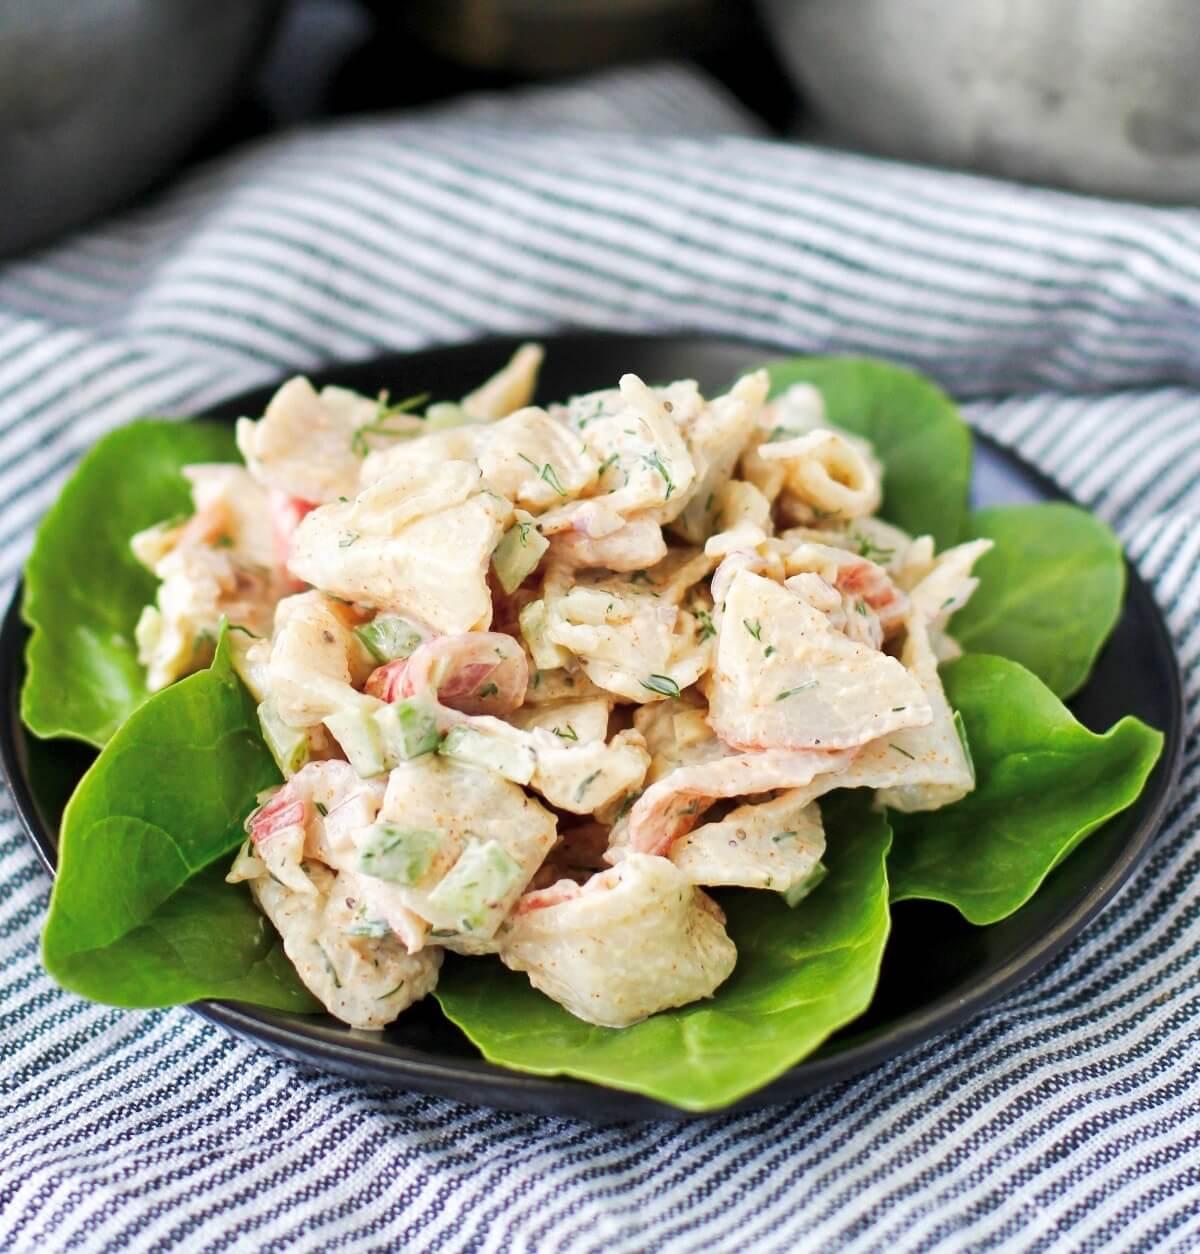 Imitation crab salad on a plate.